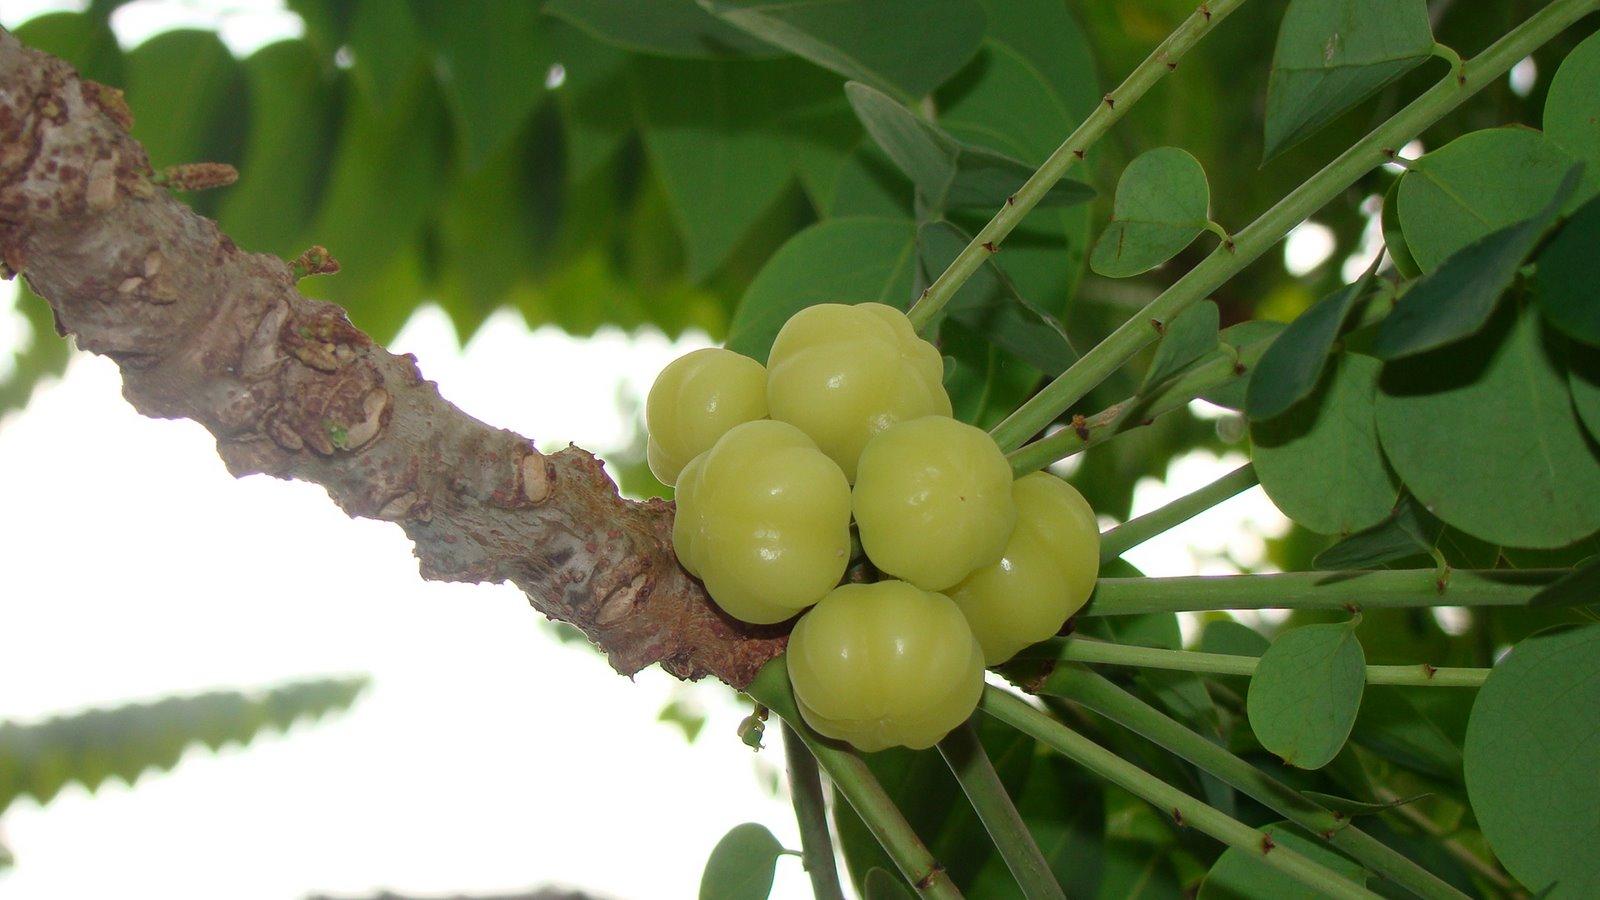 Ceremai tumbuhan berbentuk pohon, berumur panjang, daun tunggal